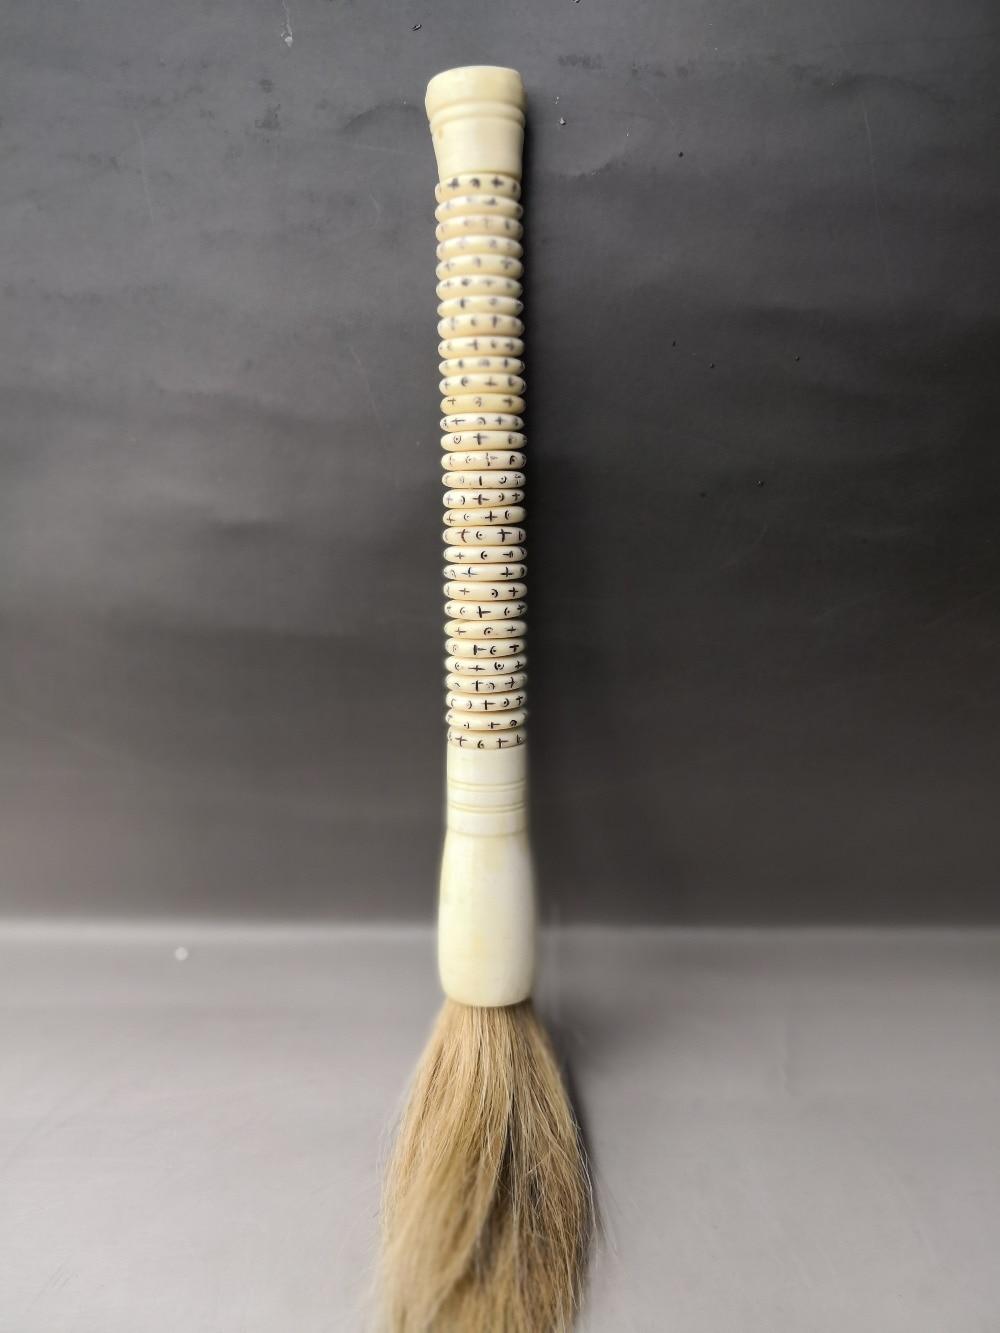 China old Made of Chinas brush